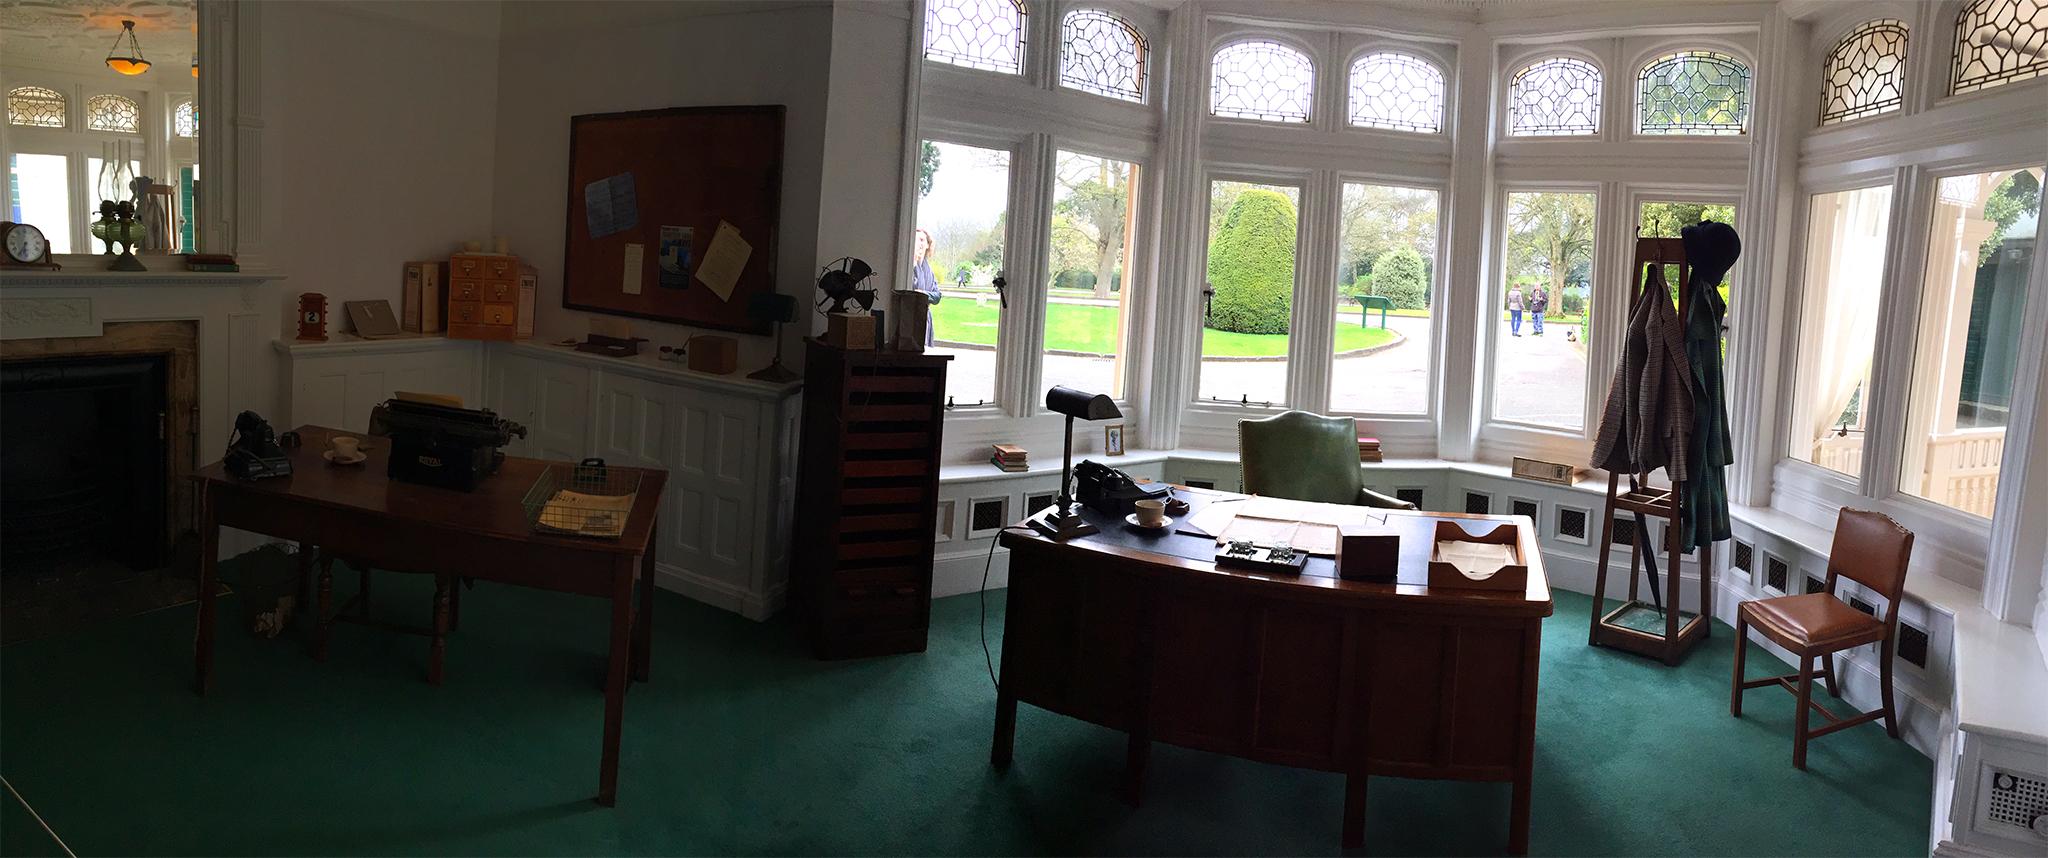 Bletchey Park, Inglaterra bletchley park - 24943053878 a1565f7e75 o - Bletchley Park, el secreto mejor guardado de Inglaterra